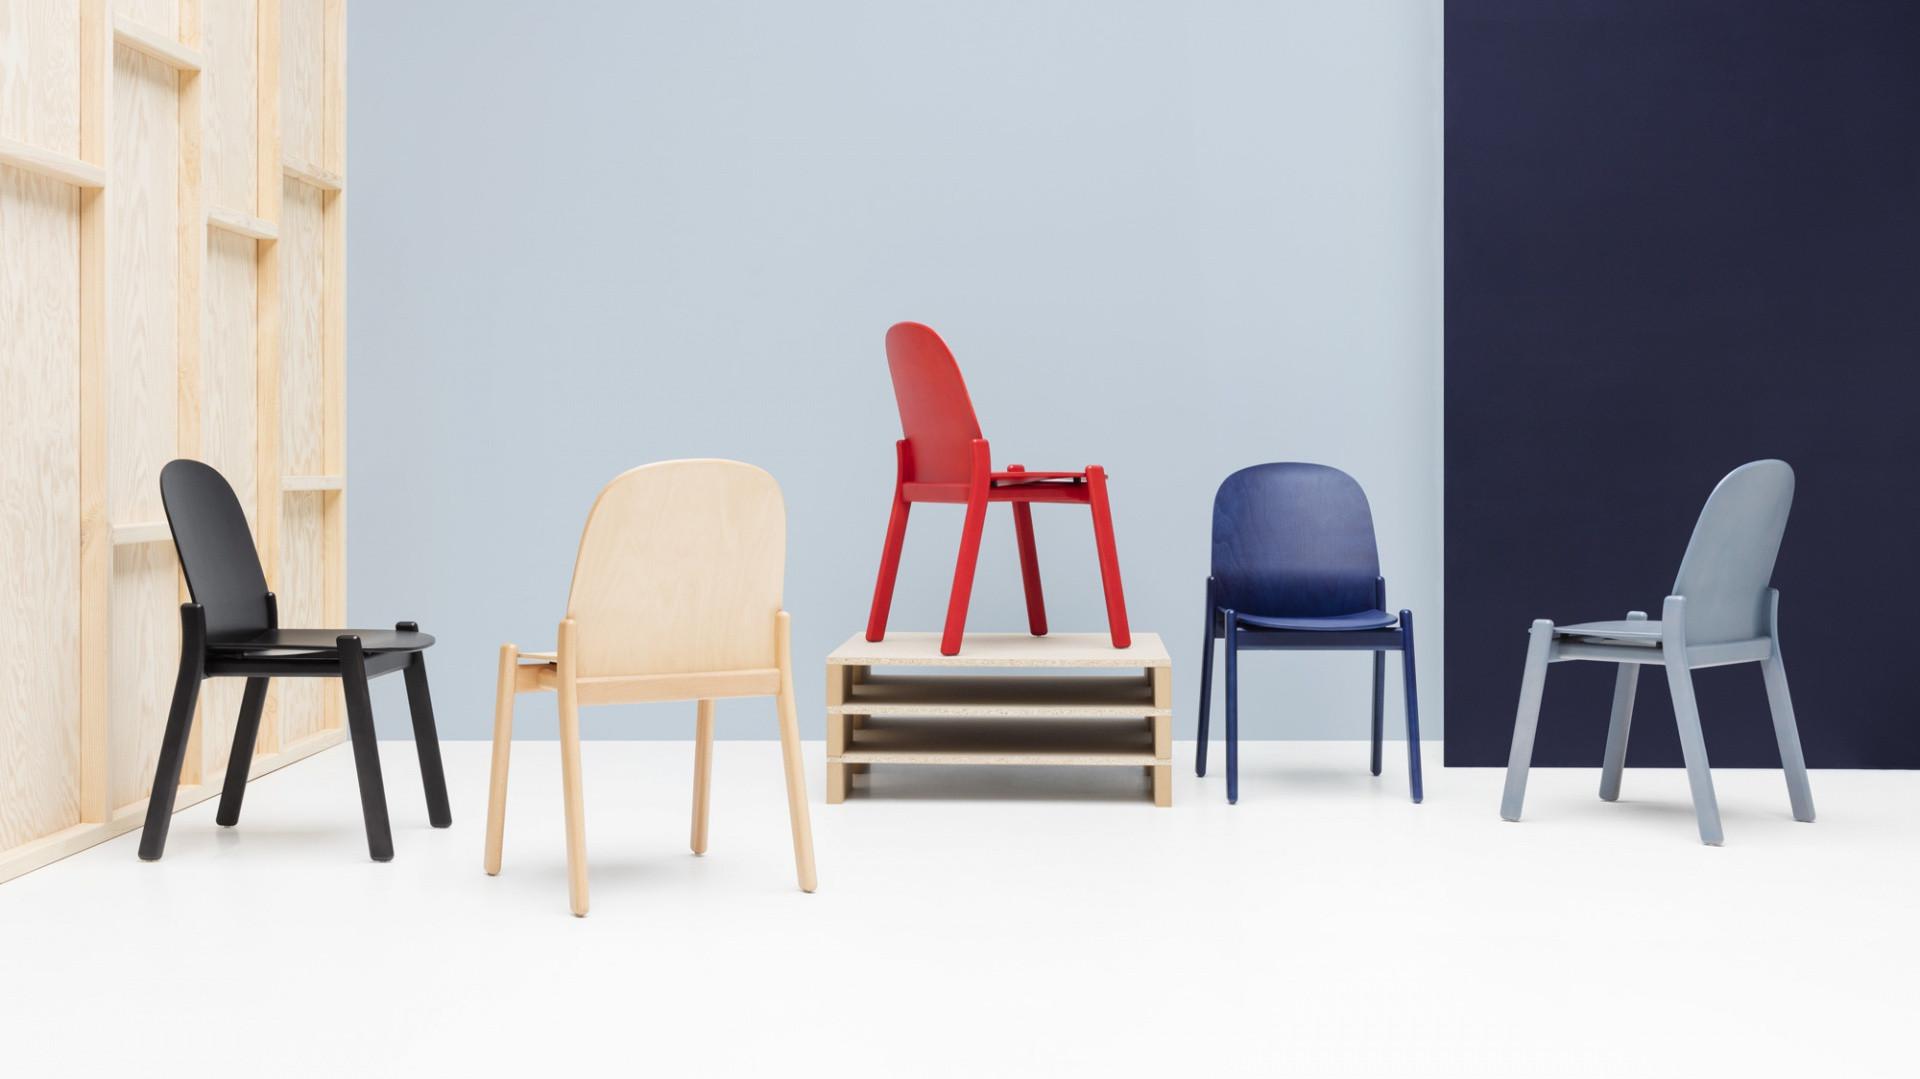 Krzesło Nordic. Fot. Noti